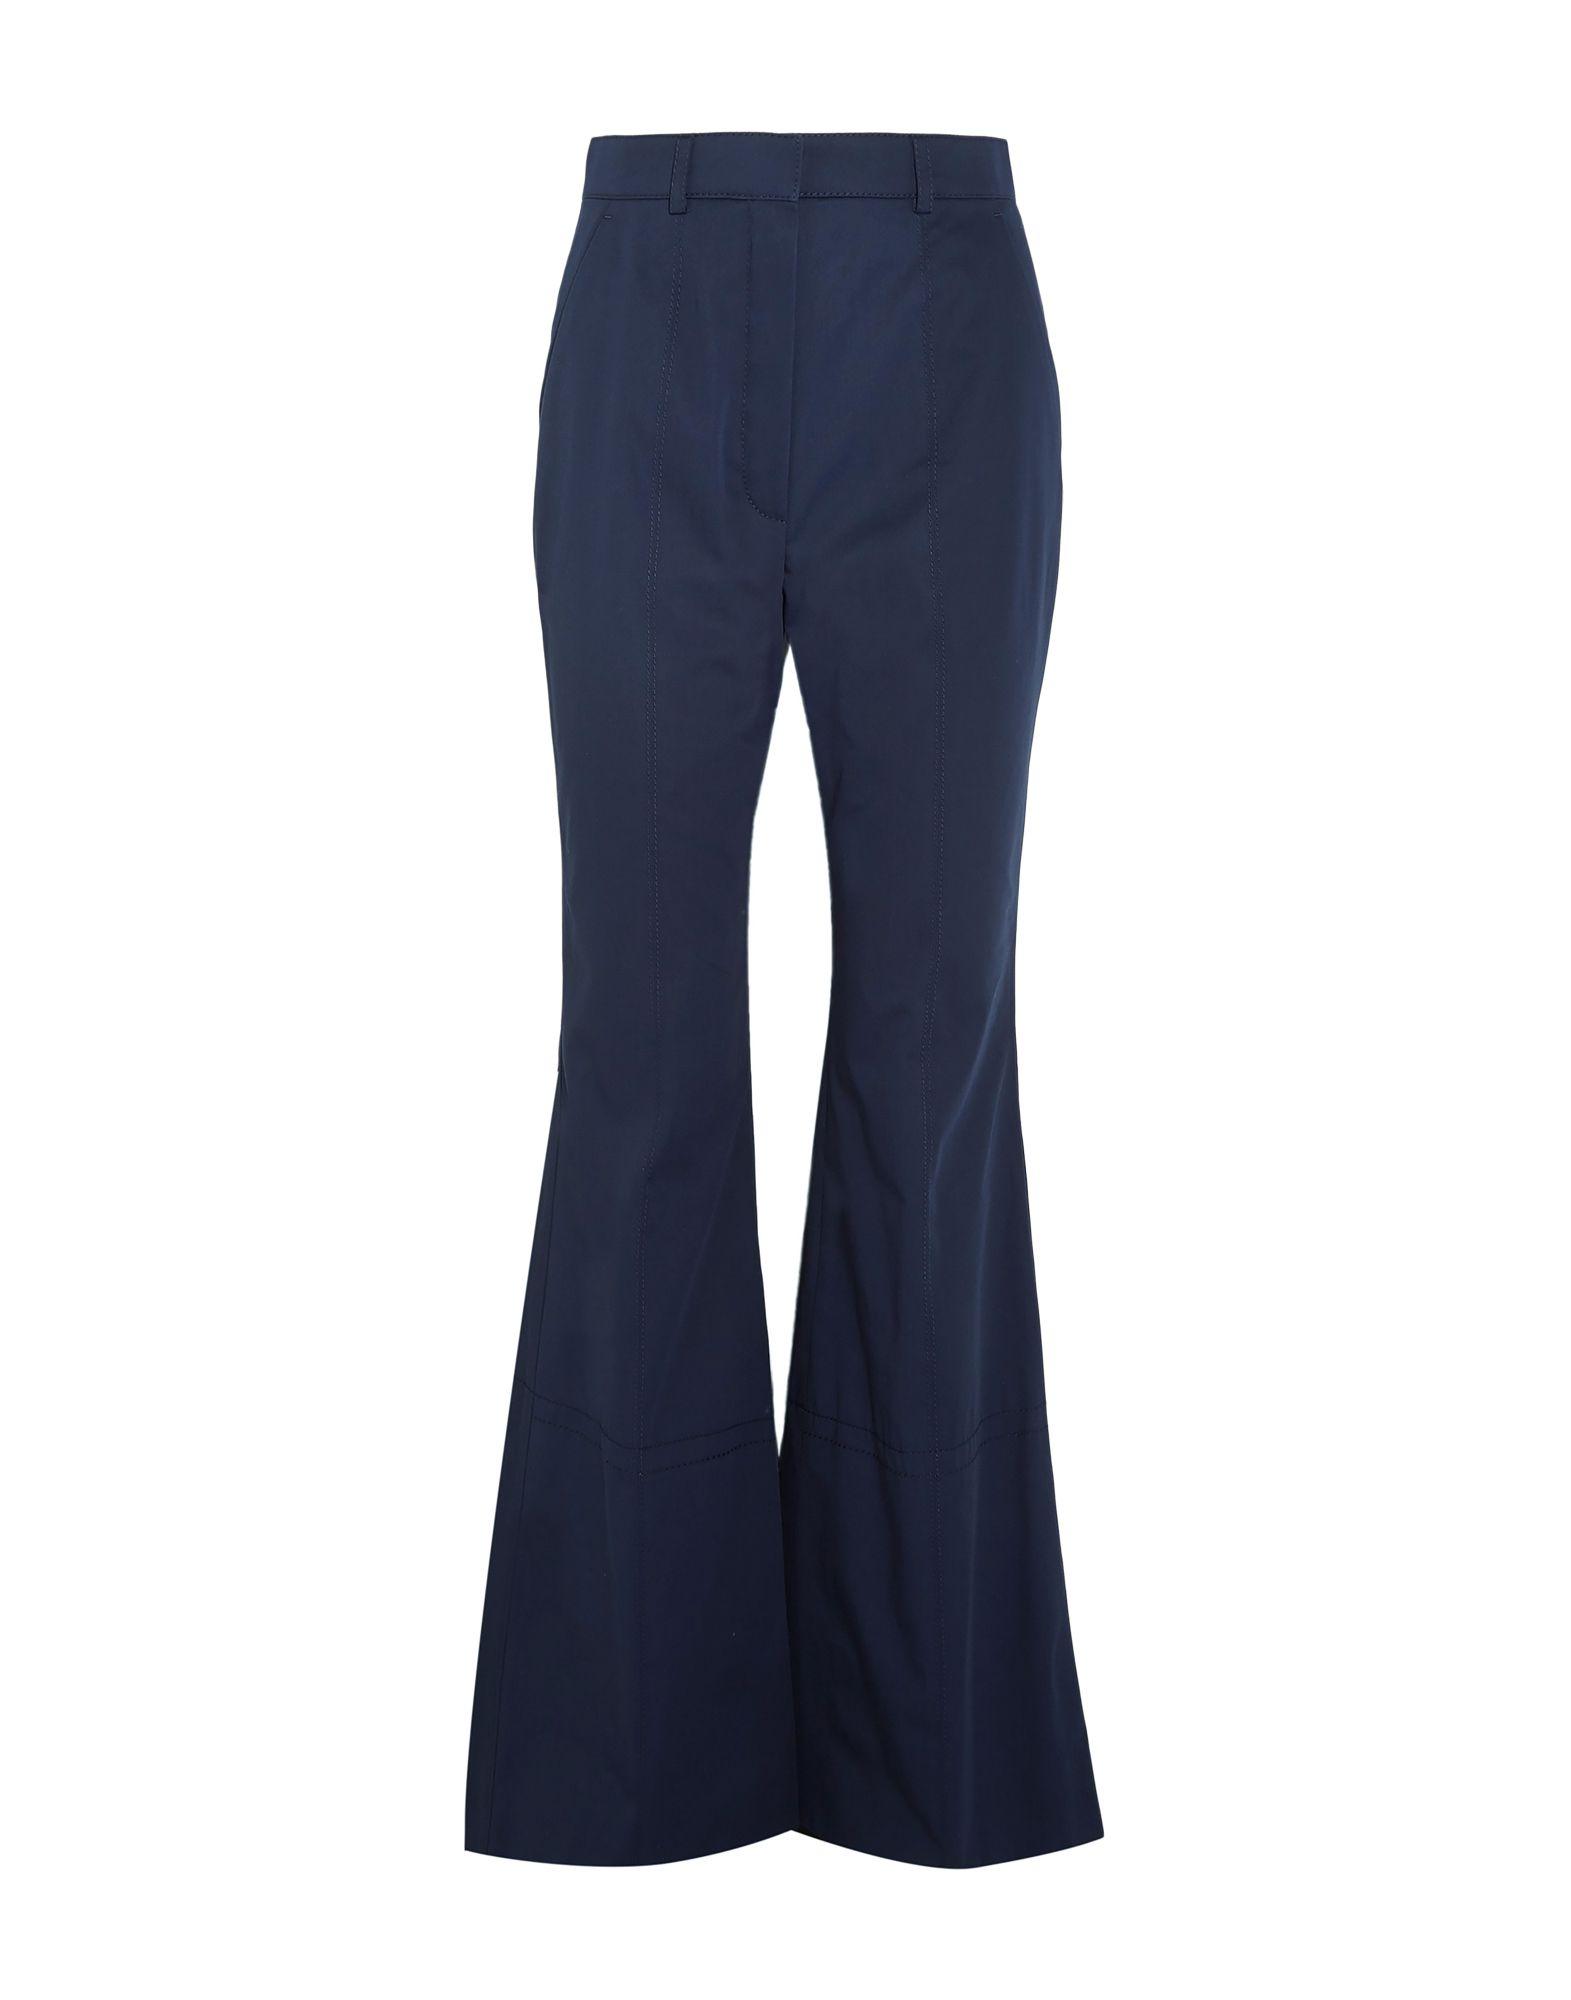 Pantalone Sonia Rykiel donna donna - 13255925QM  Online-Verkauf